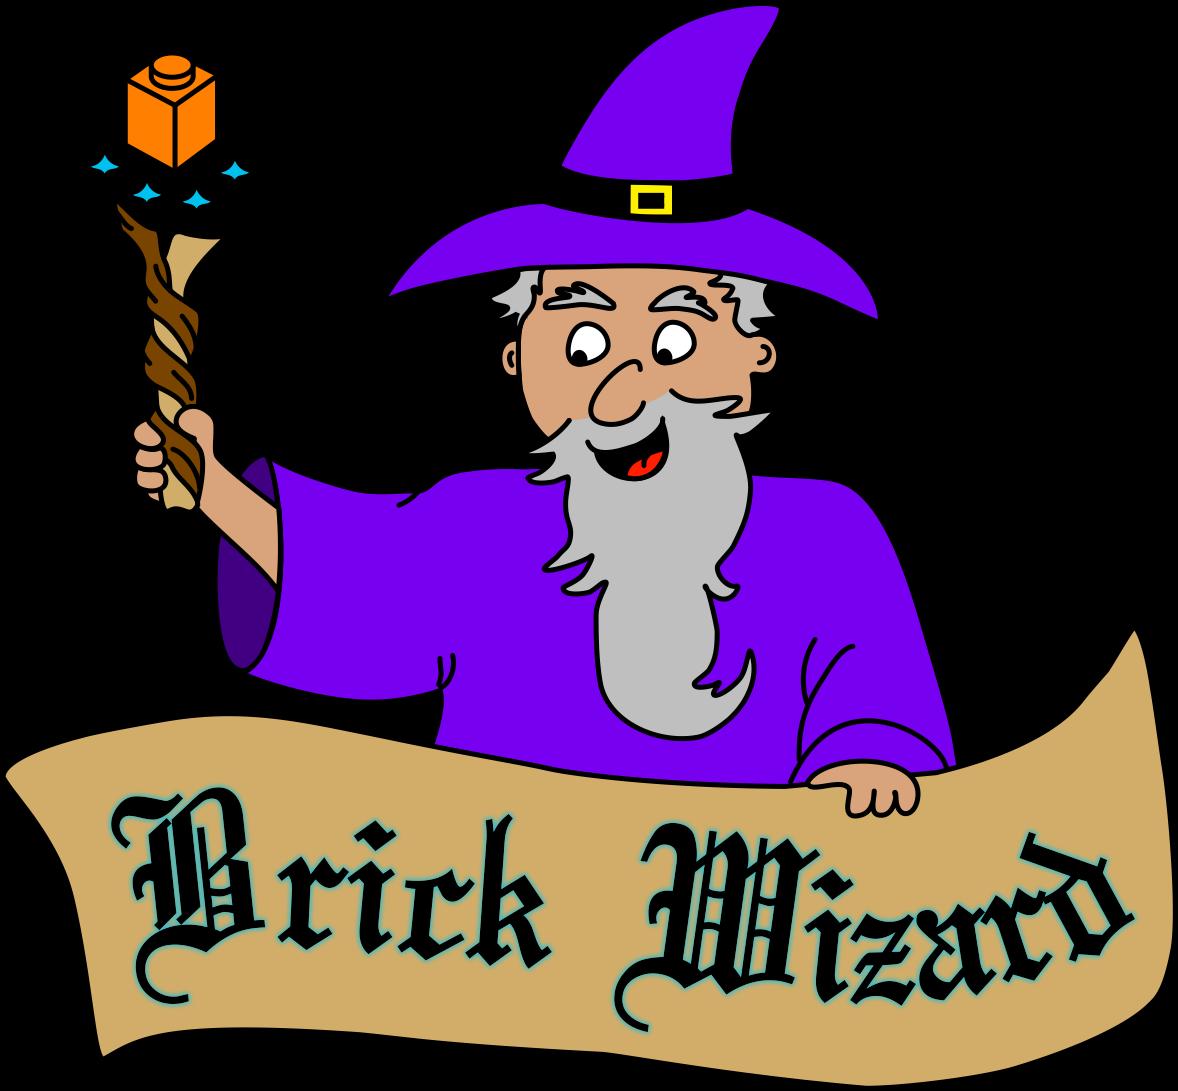 Brick Wizard